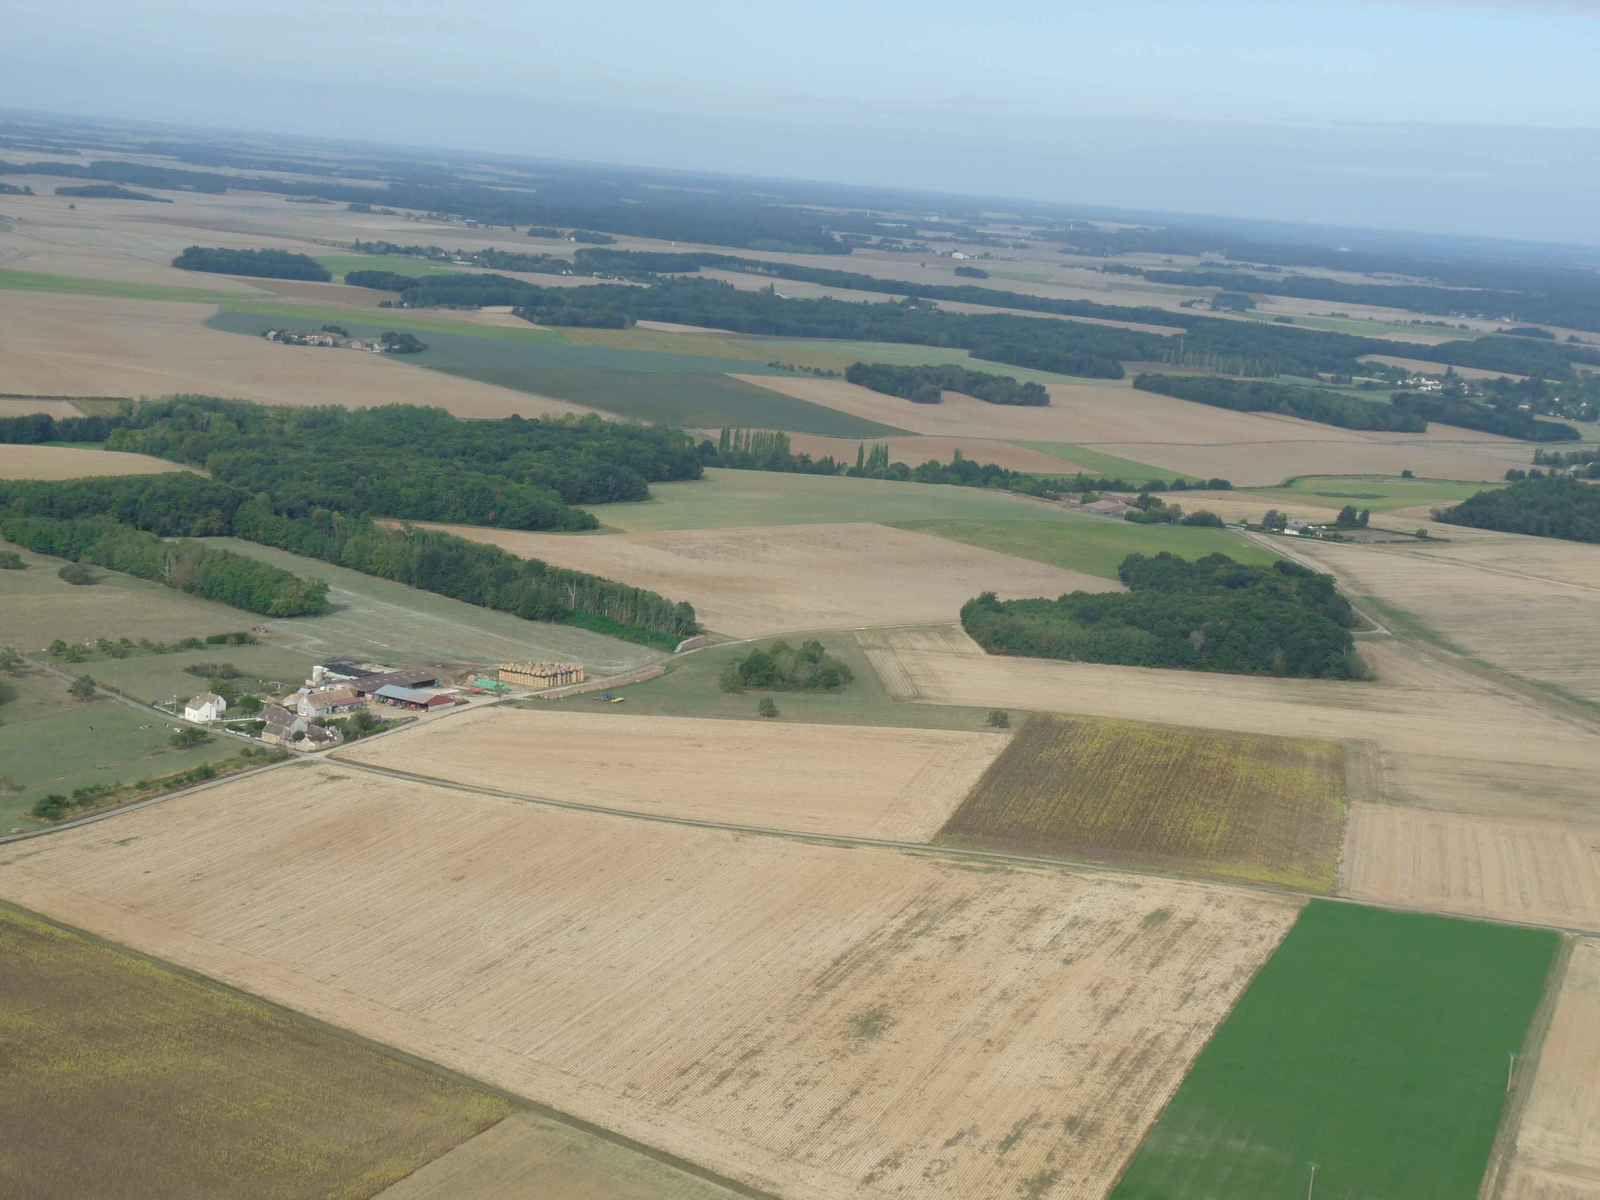 Vol entre paramotoristes (6 septembre 2020)